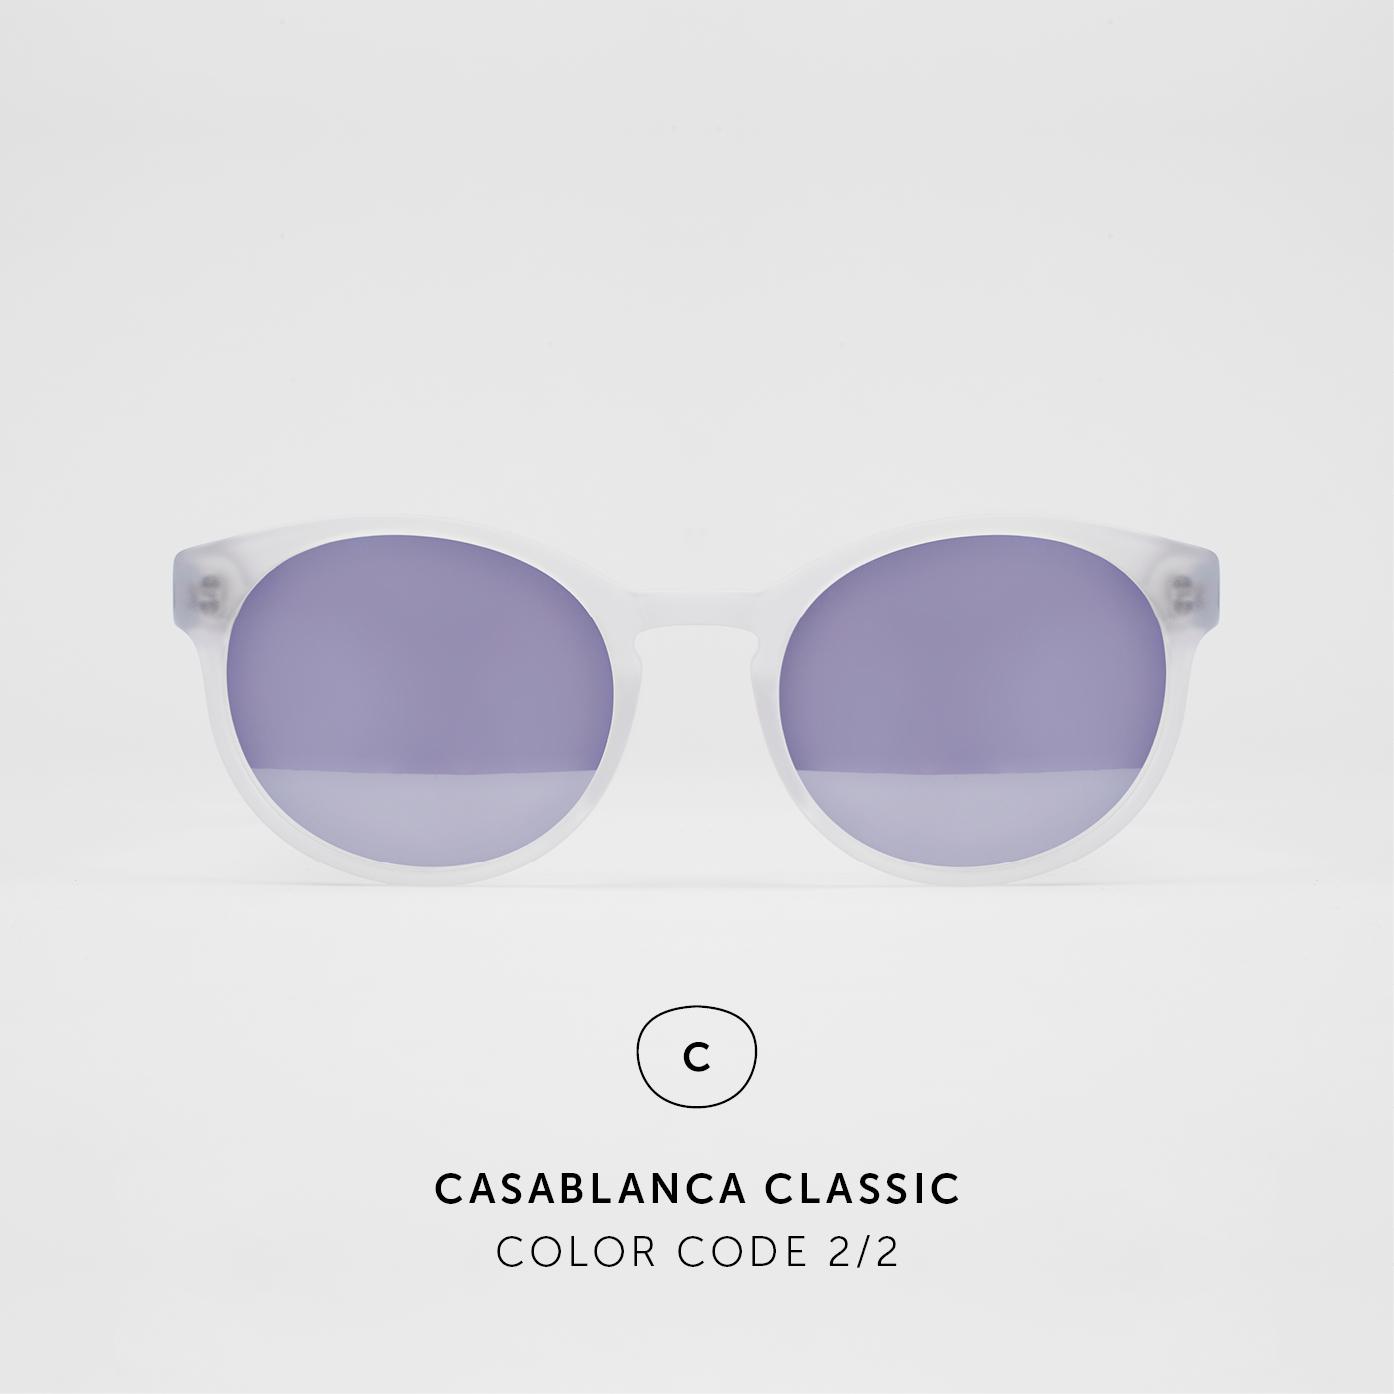 CasablancaClassic20.jpg